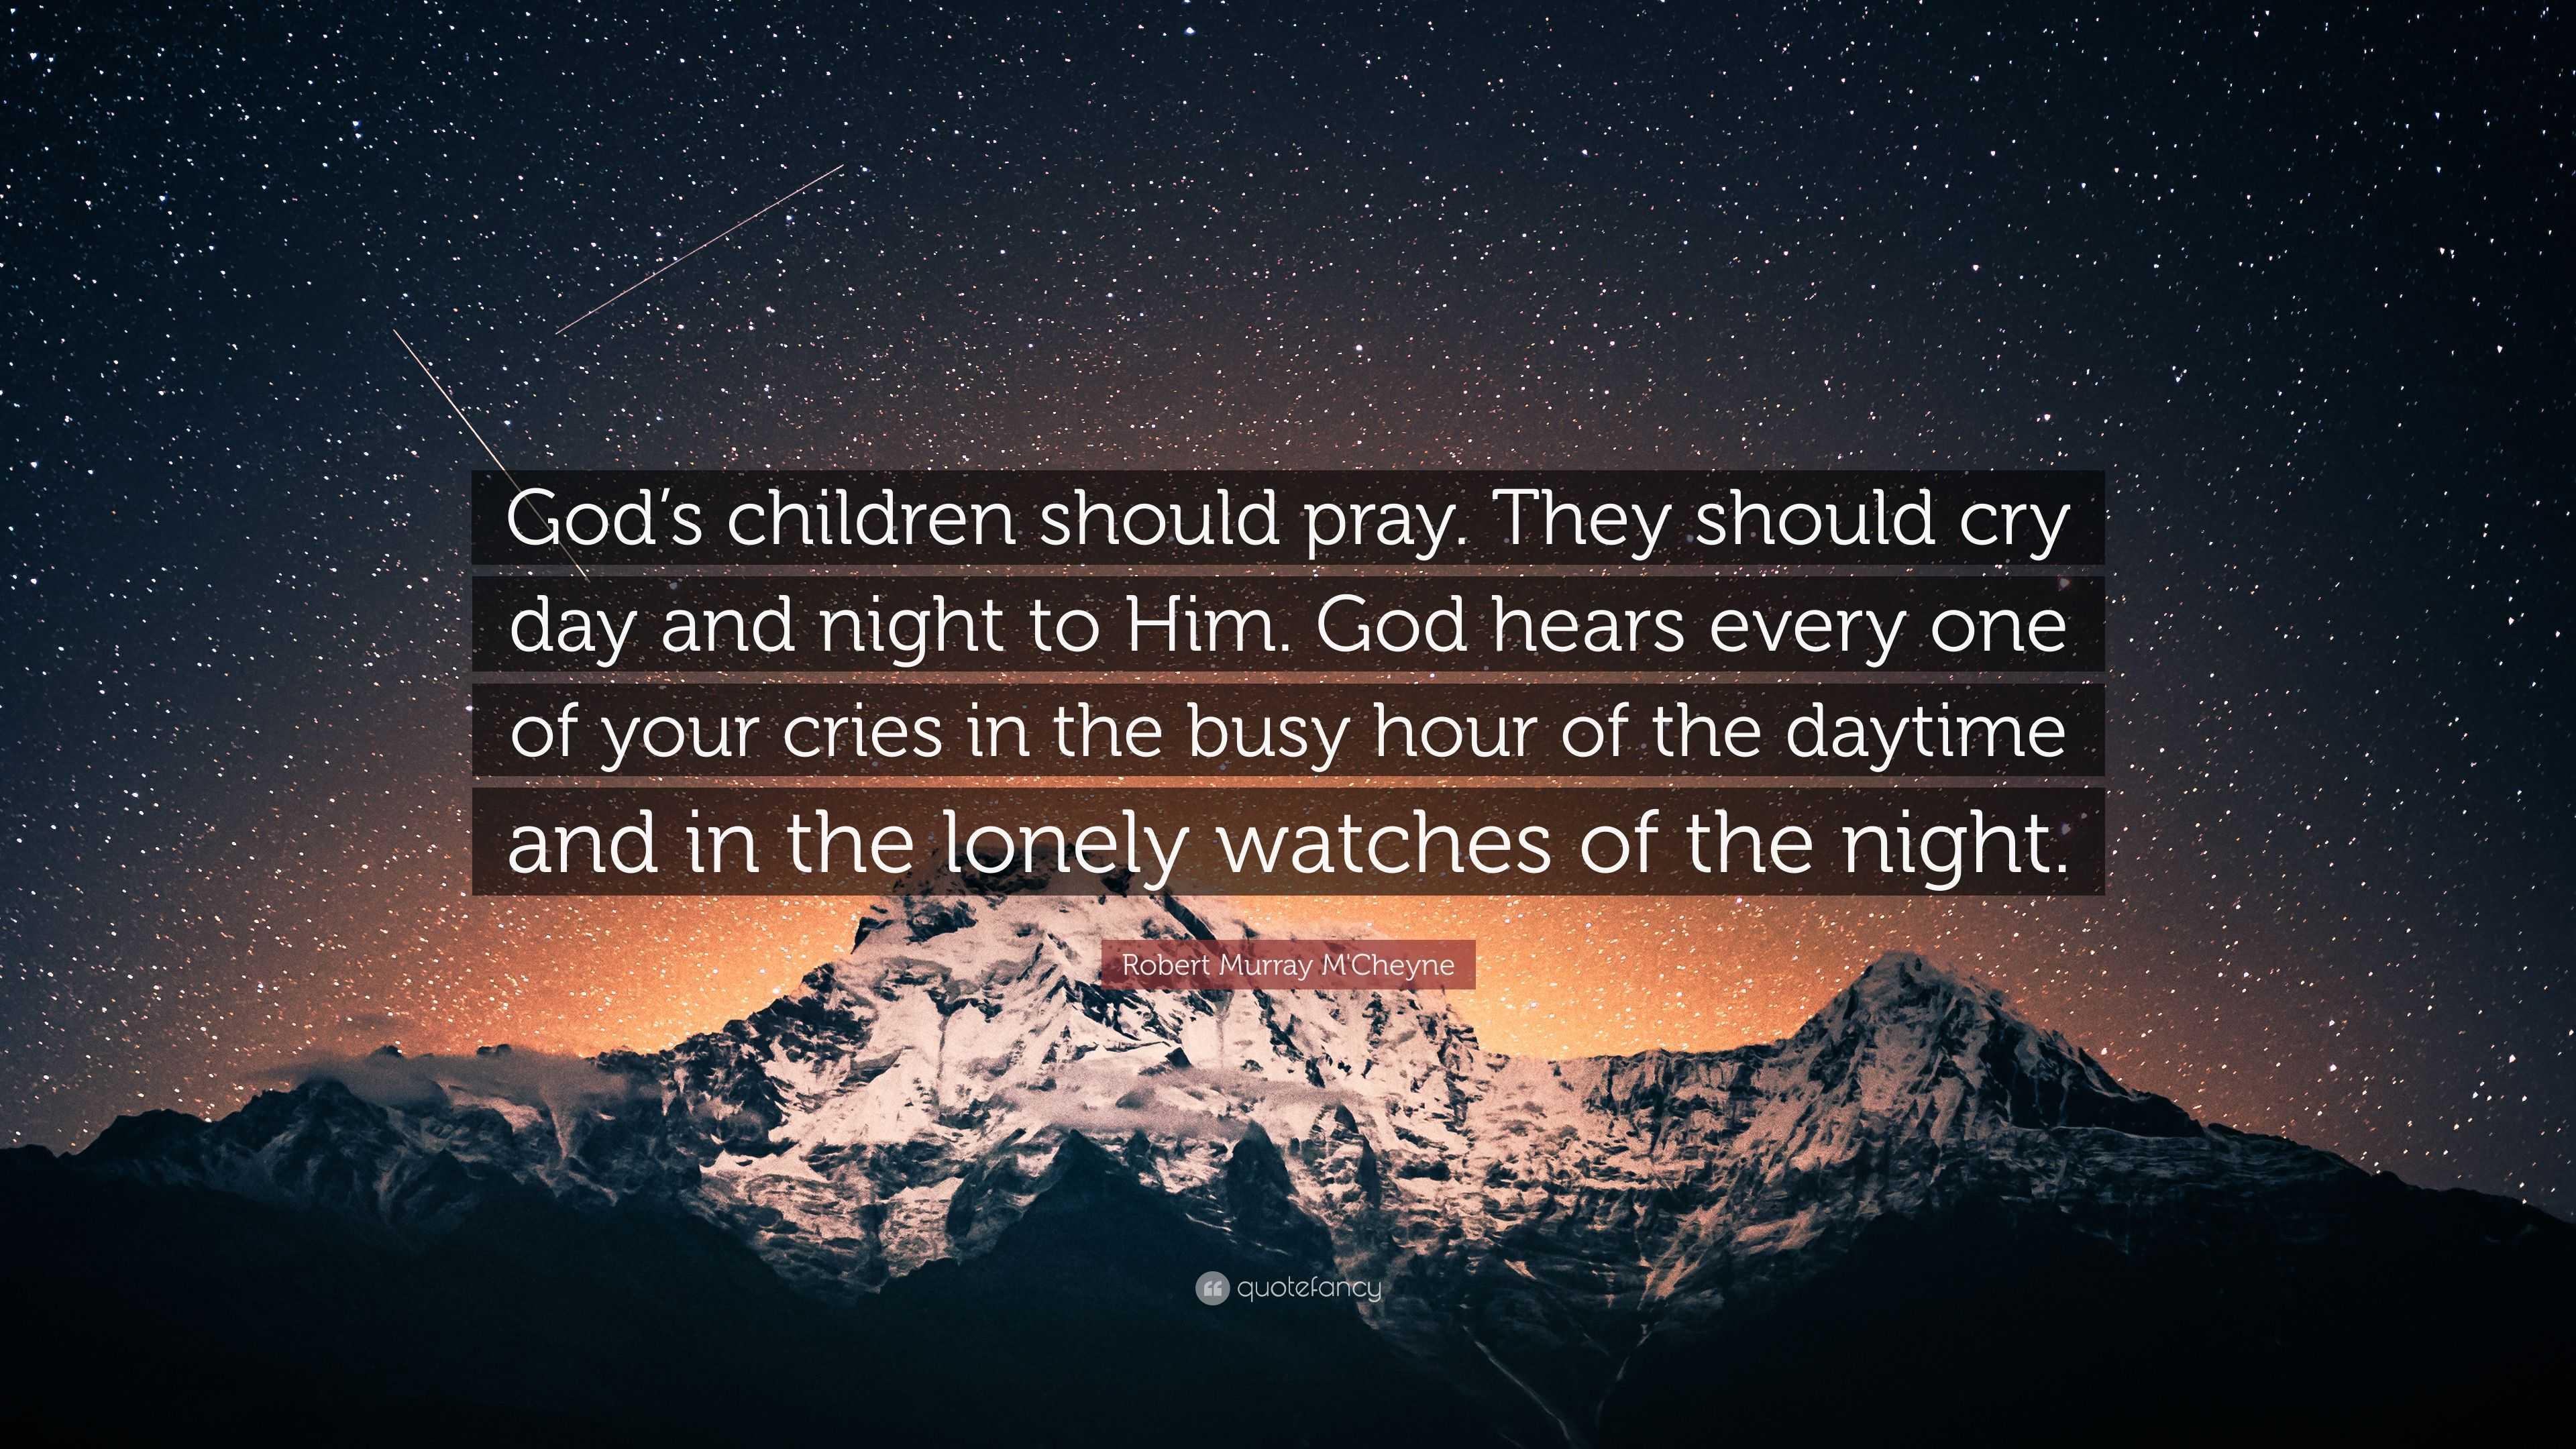 Fantastic Wallpaper Night God - 3171501-Robert-Murray-M-Cheyne-Quote-God-s-children-should-pray-They  Photograph-813073.jpg